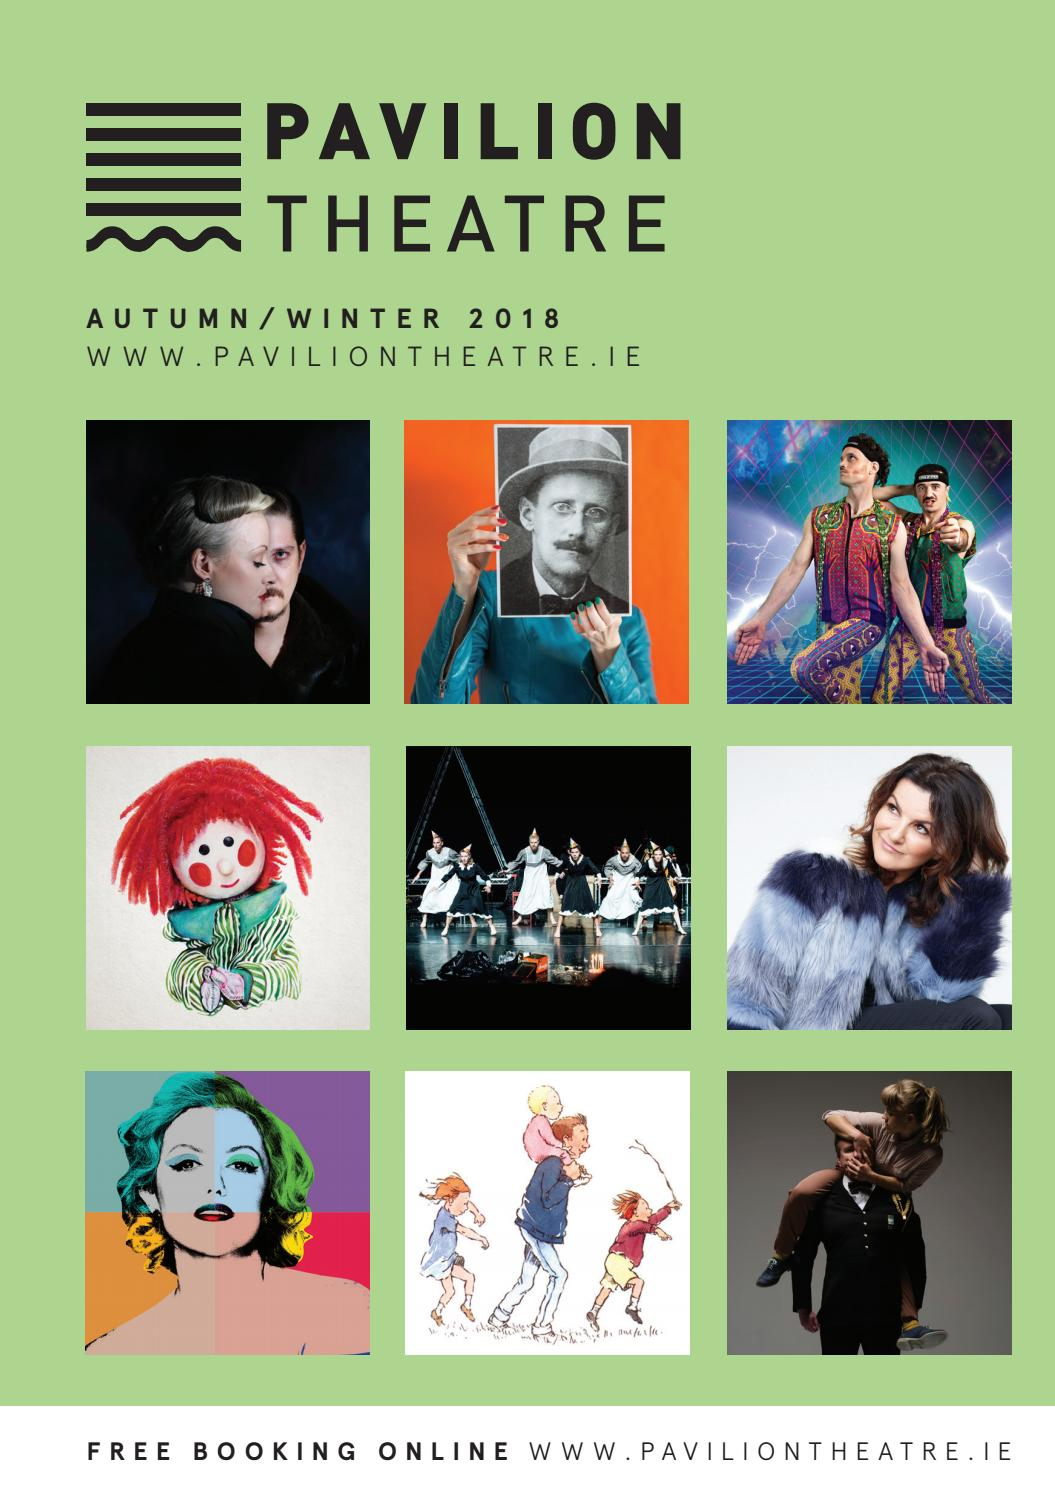 3f866b24c1dc Pavilion Theatre Autumn/Winter 2018 Brochure by Pavilion Theatre - issuu